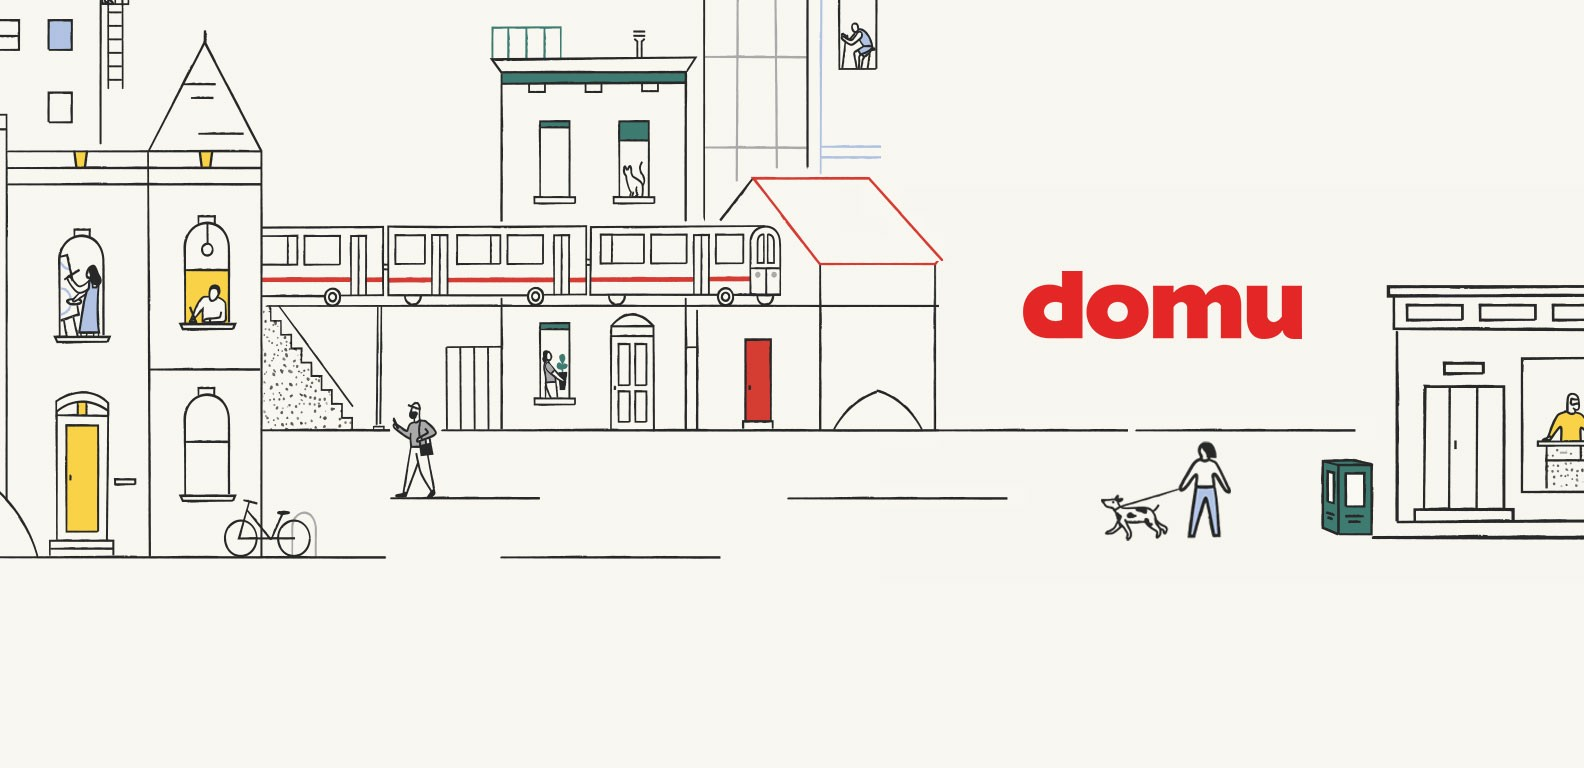 Domu Chicago Apartments | LinkedIn